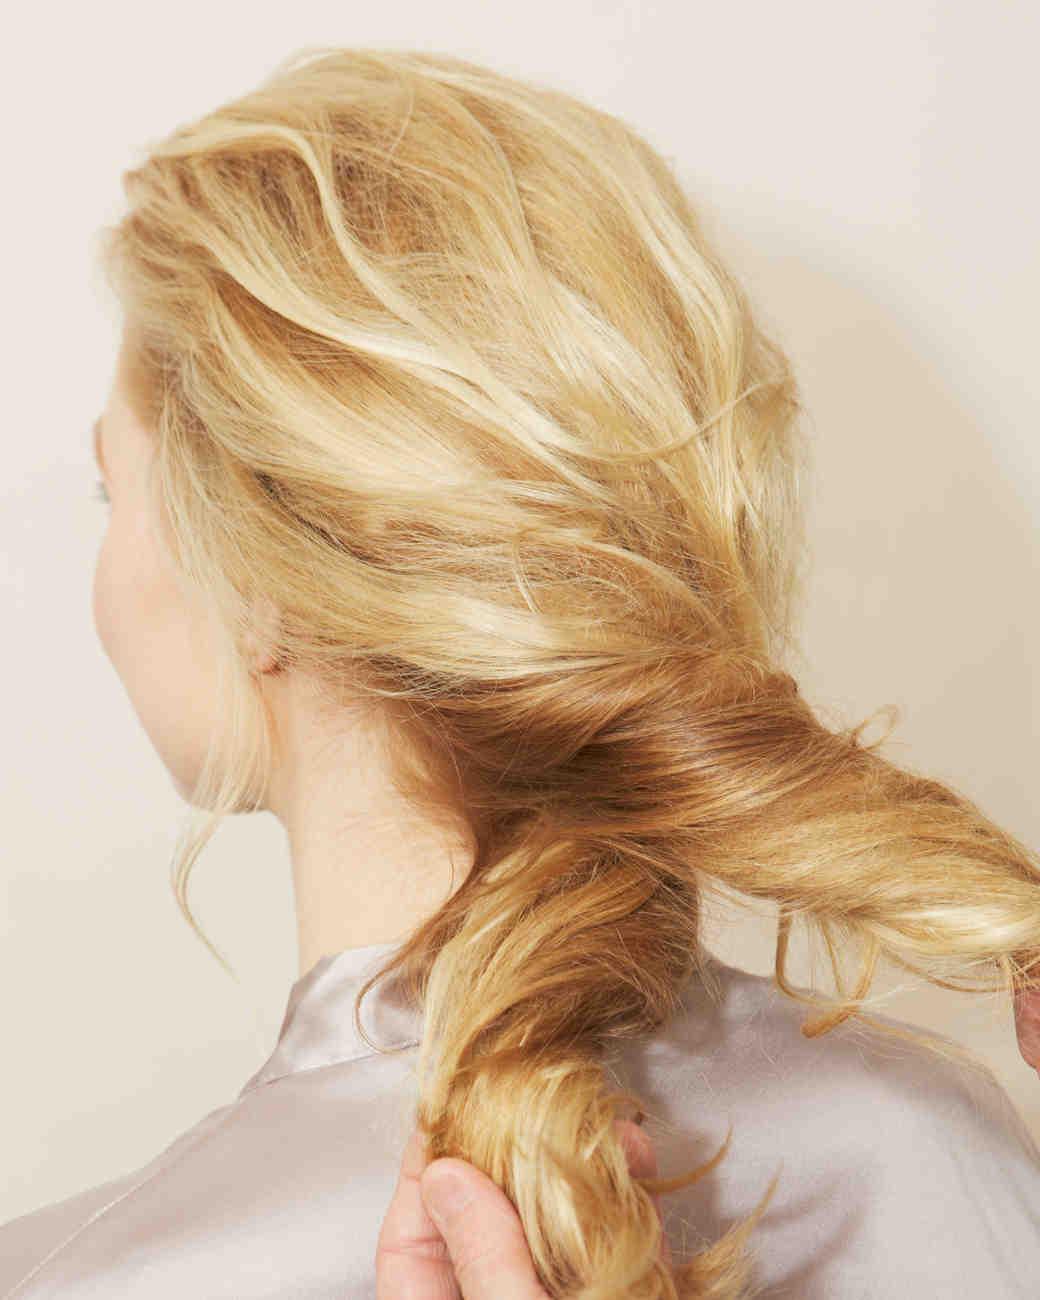 hair-prep-updo-734-wd110254.jpg